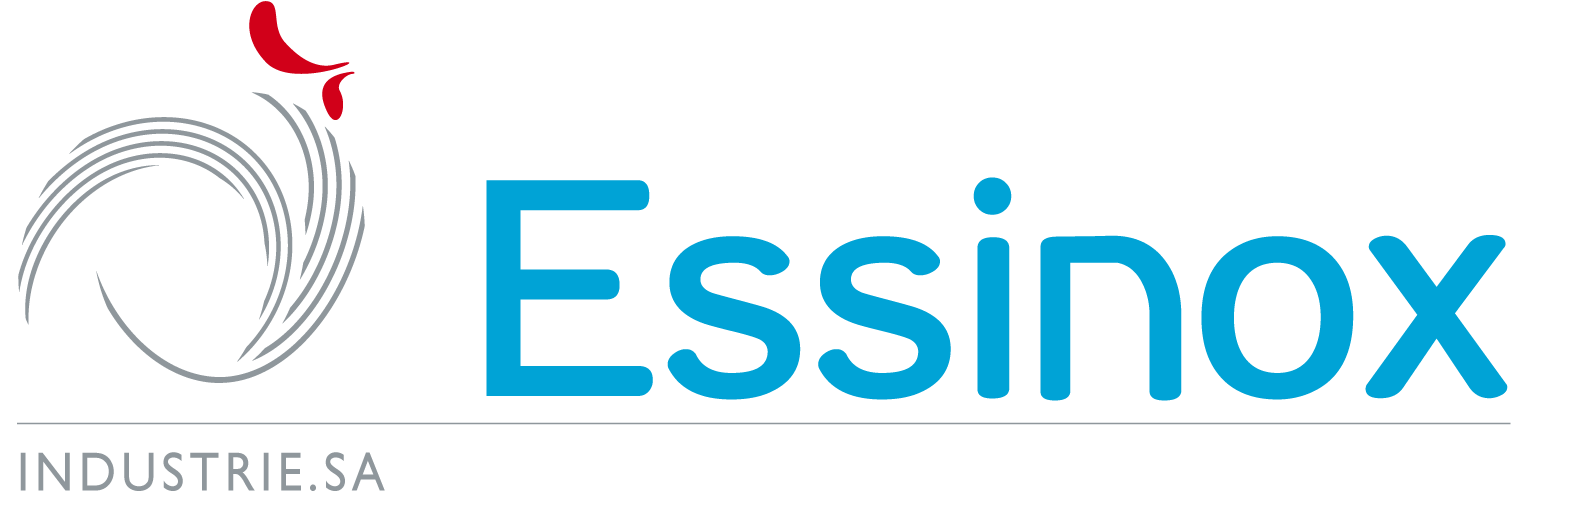 Logo essinox